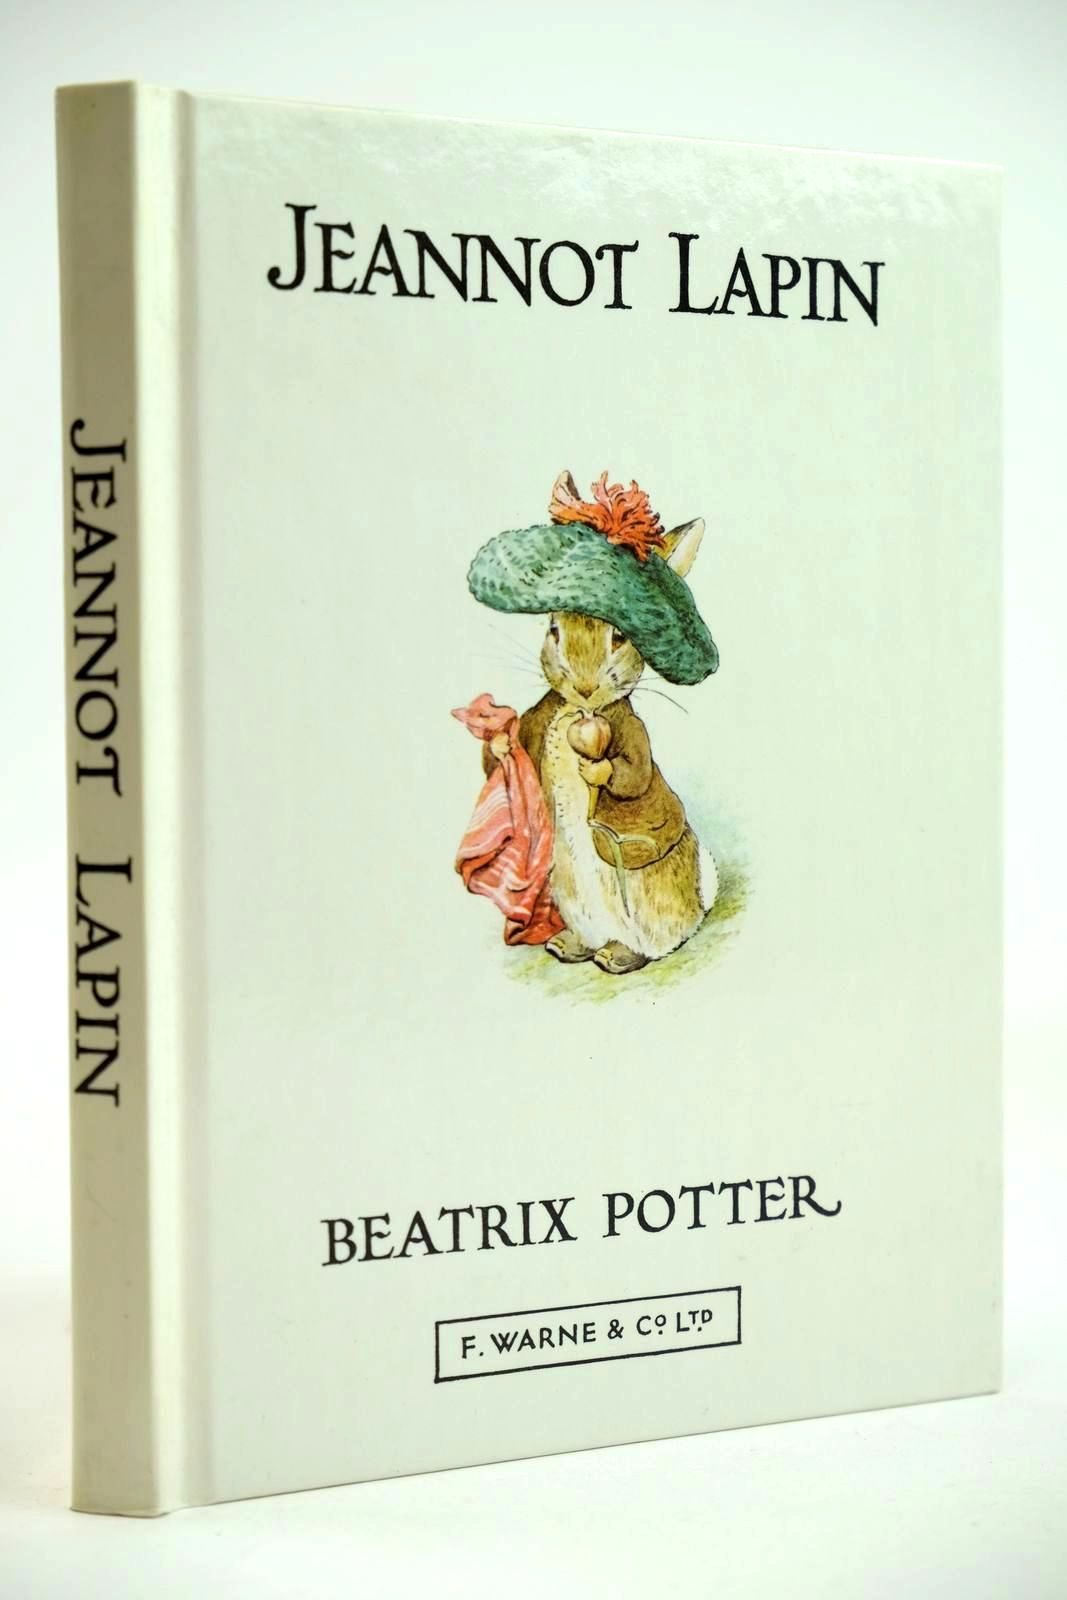 Photo of L'HISTOIRE DE JEANNOT LAPIN written by Potter, Beatrix Profichet, Julienne illustrated by Potter, Beatrix published by Frederick Warne & Co Ltd. (STOCK CODE: 2132064)  for sale by Stella & Rose's Books